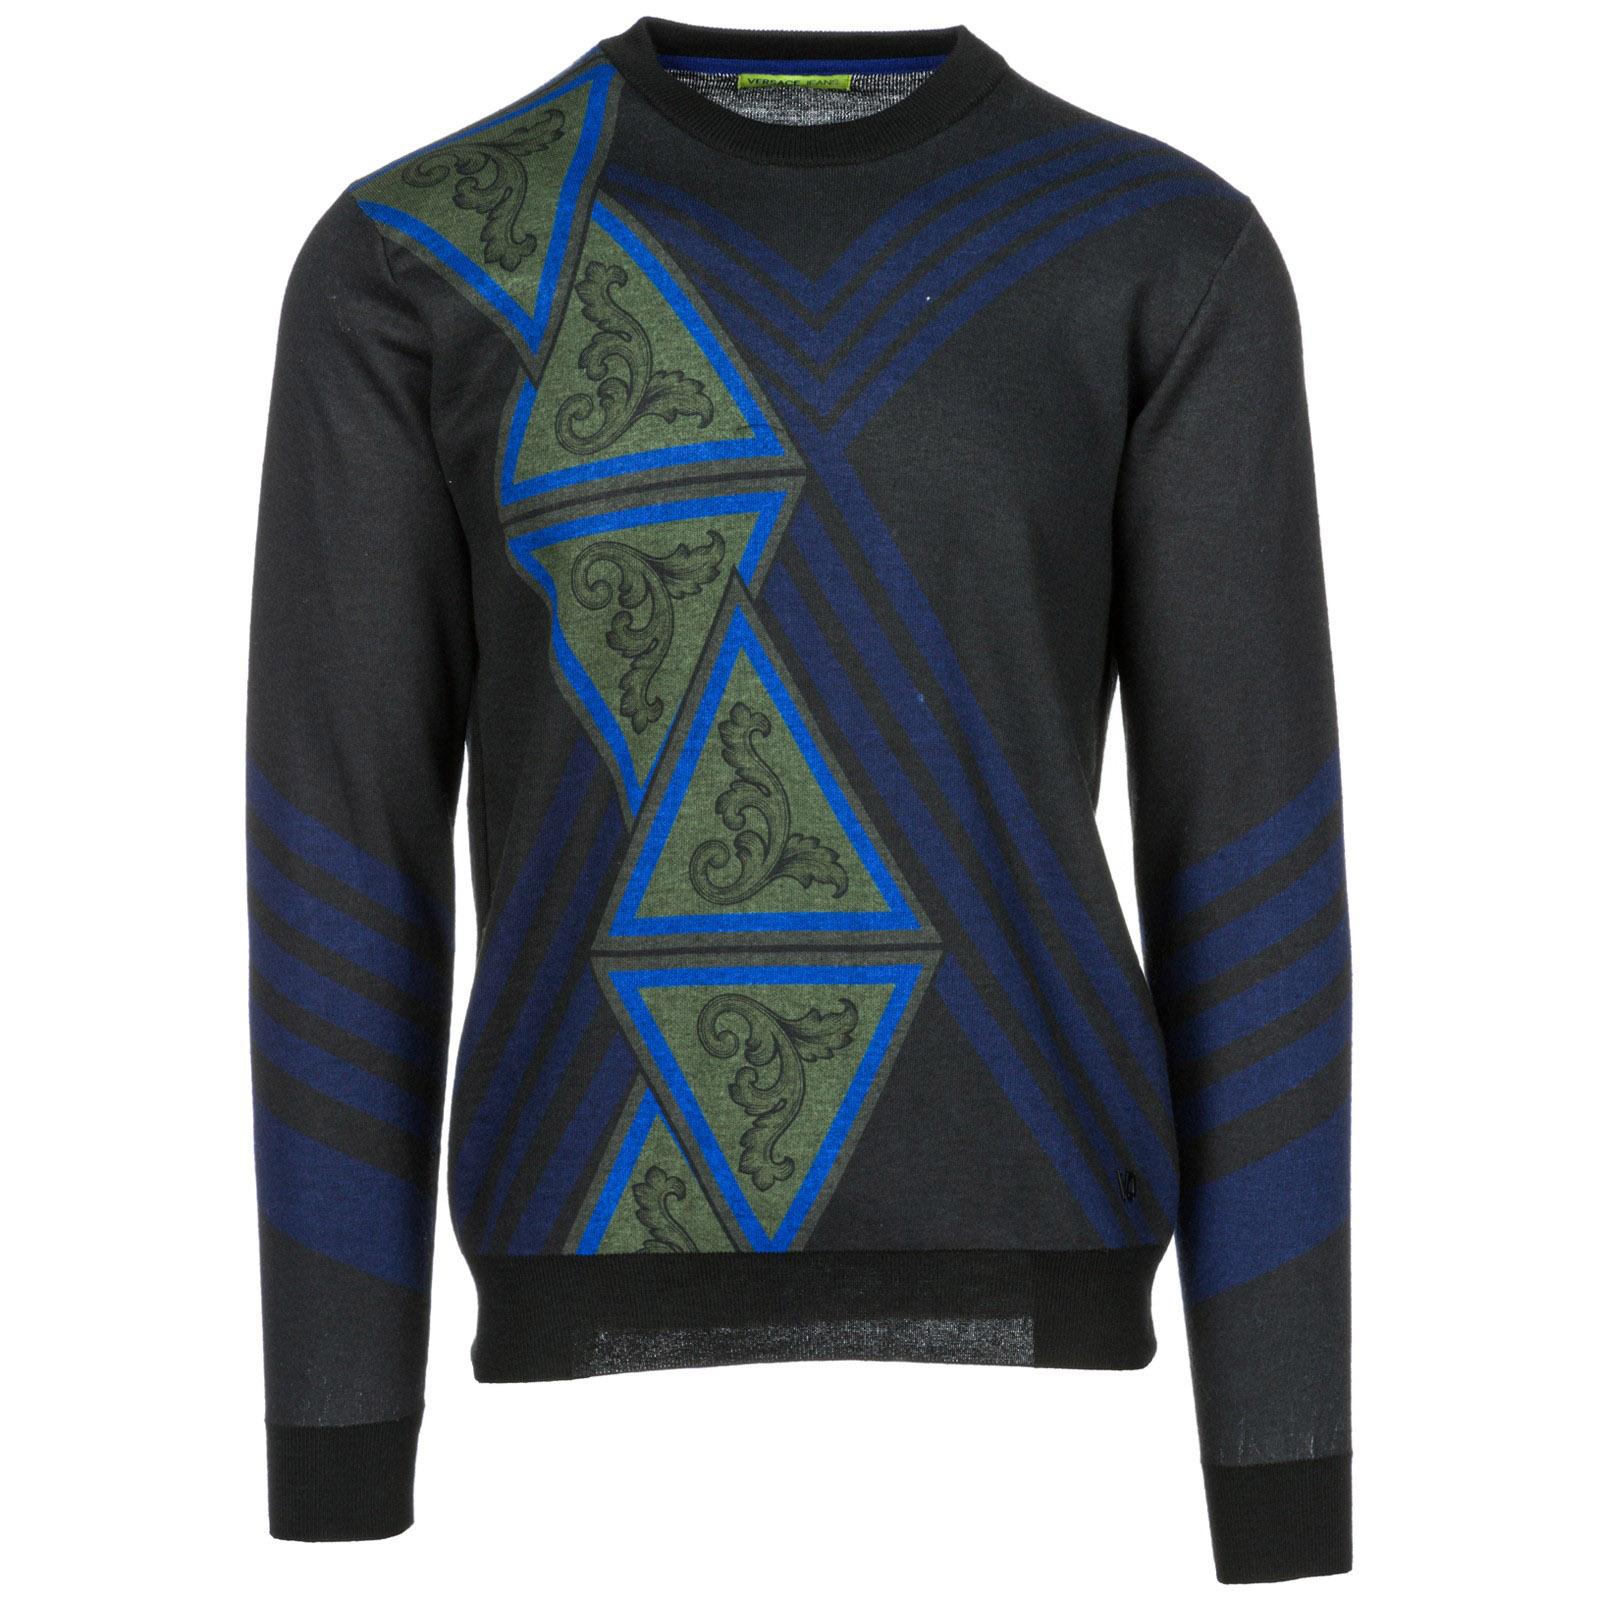 VERSACE JEANS Men'S Crew Neck Neckline Jumper Sweater Pullover in Black